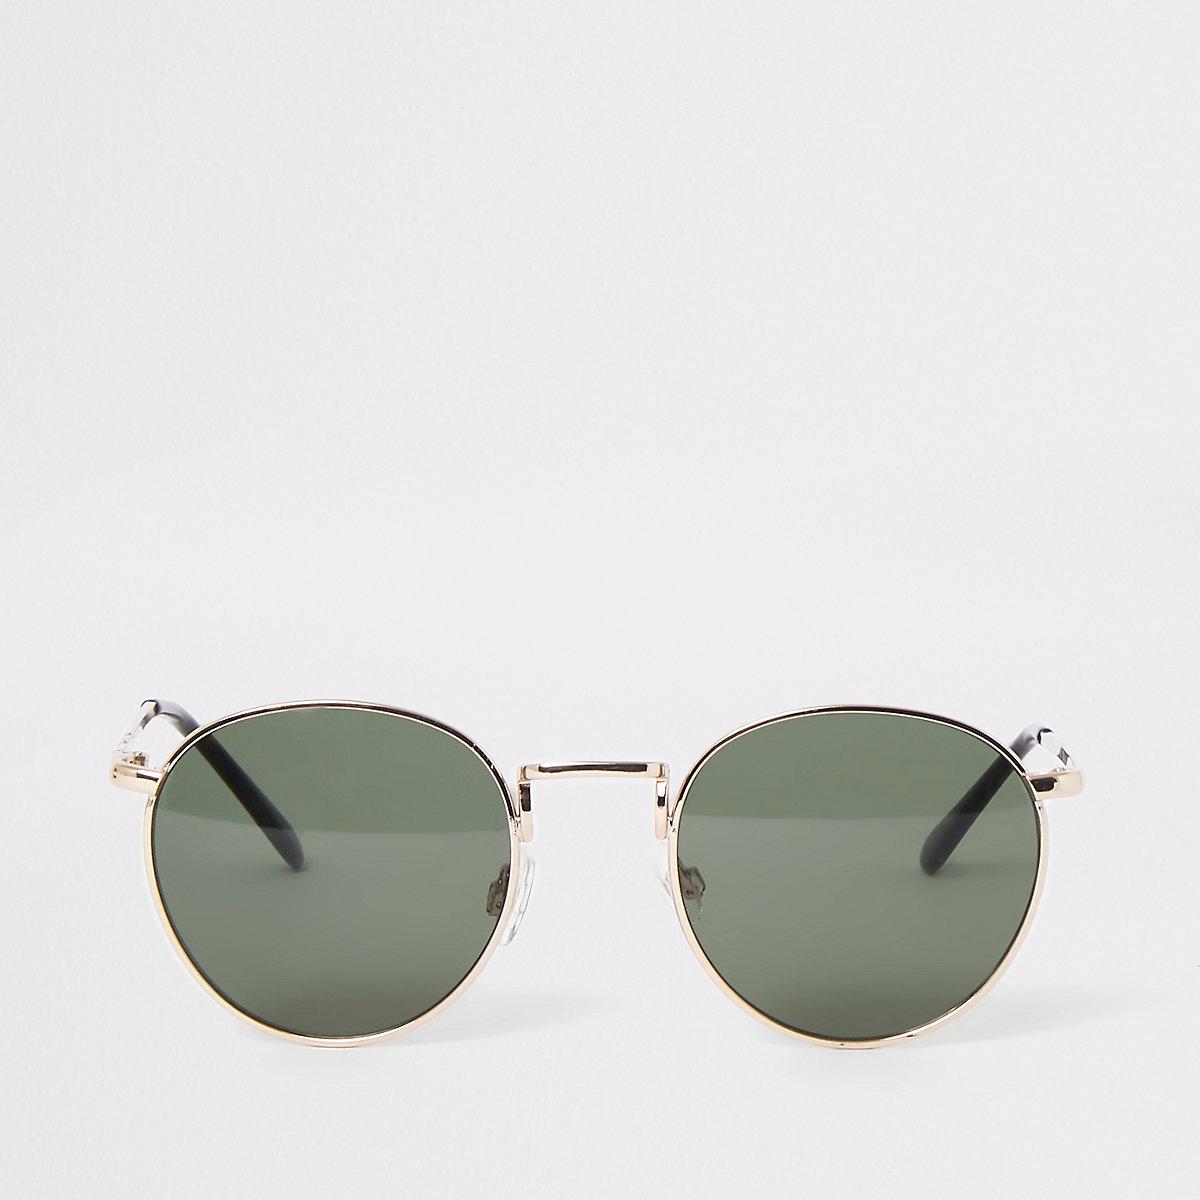 Gold color round sunglasses